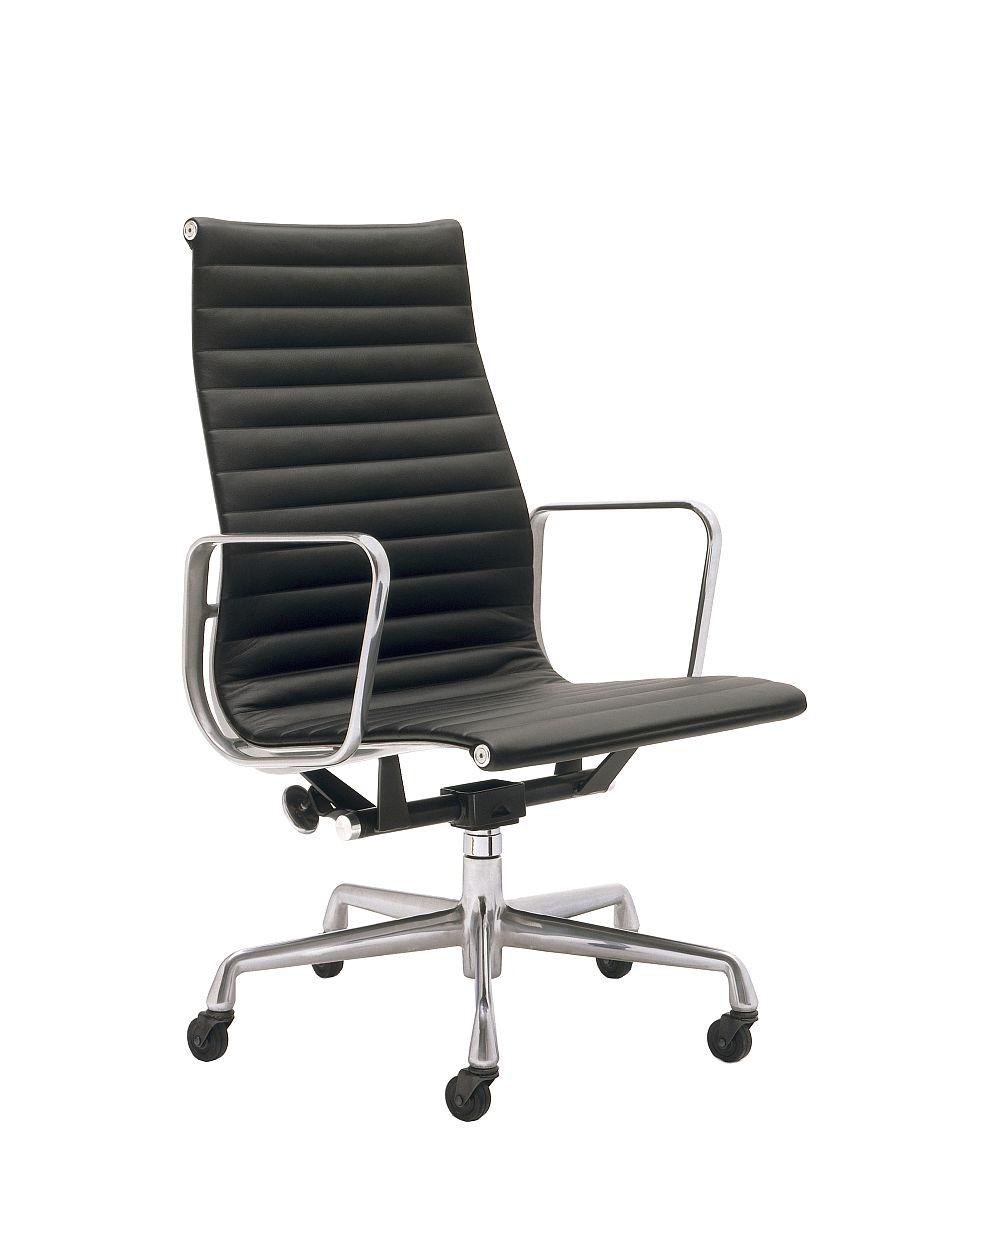 Стулья для офиса, фото модели Eames. Фото 1